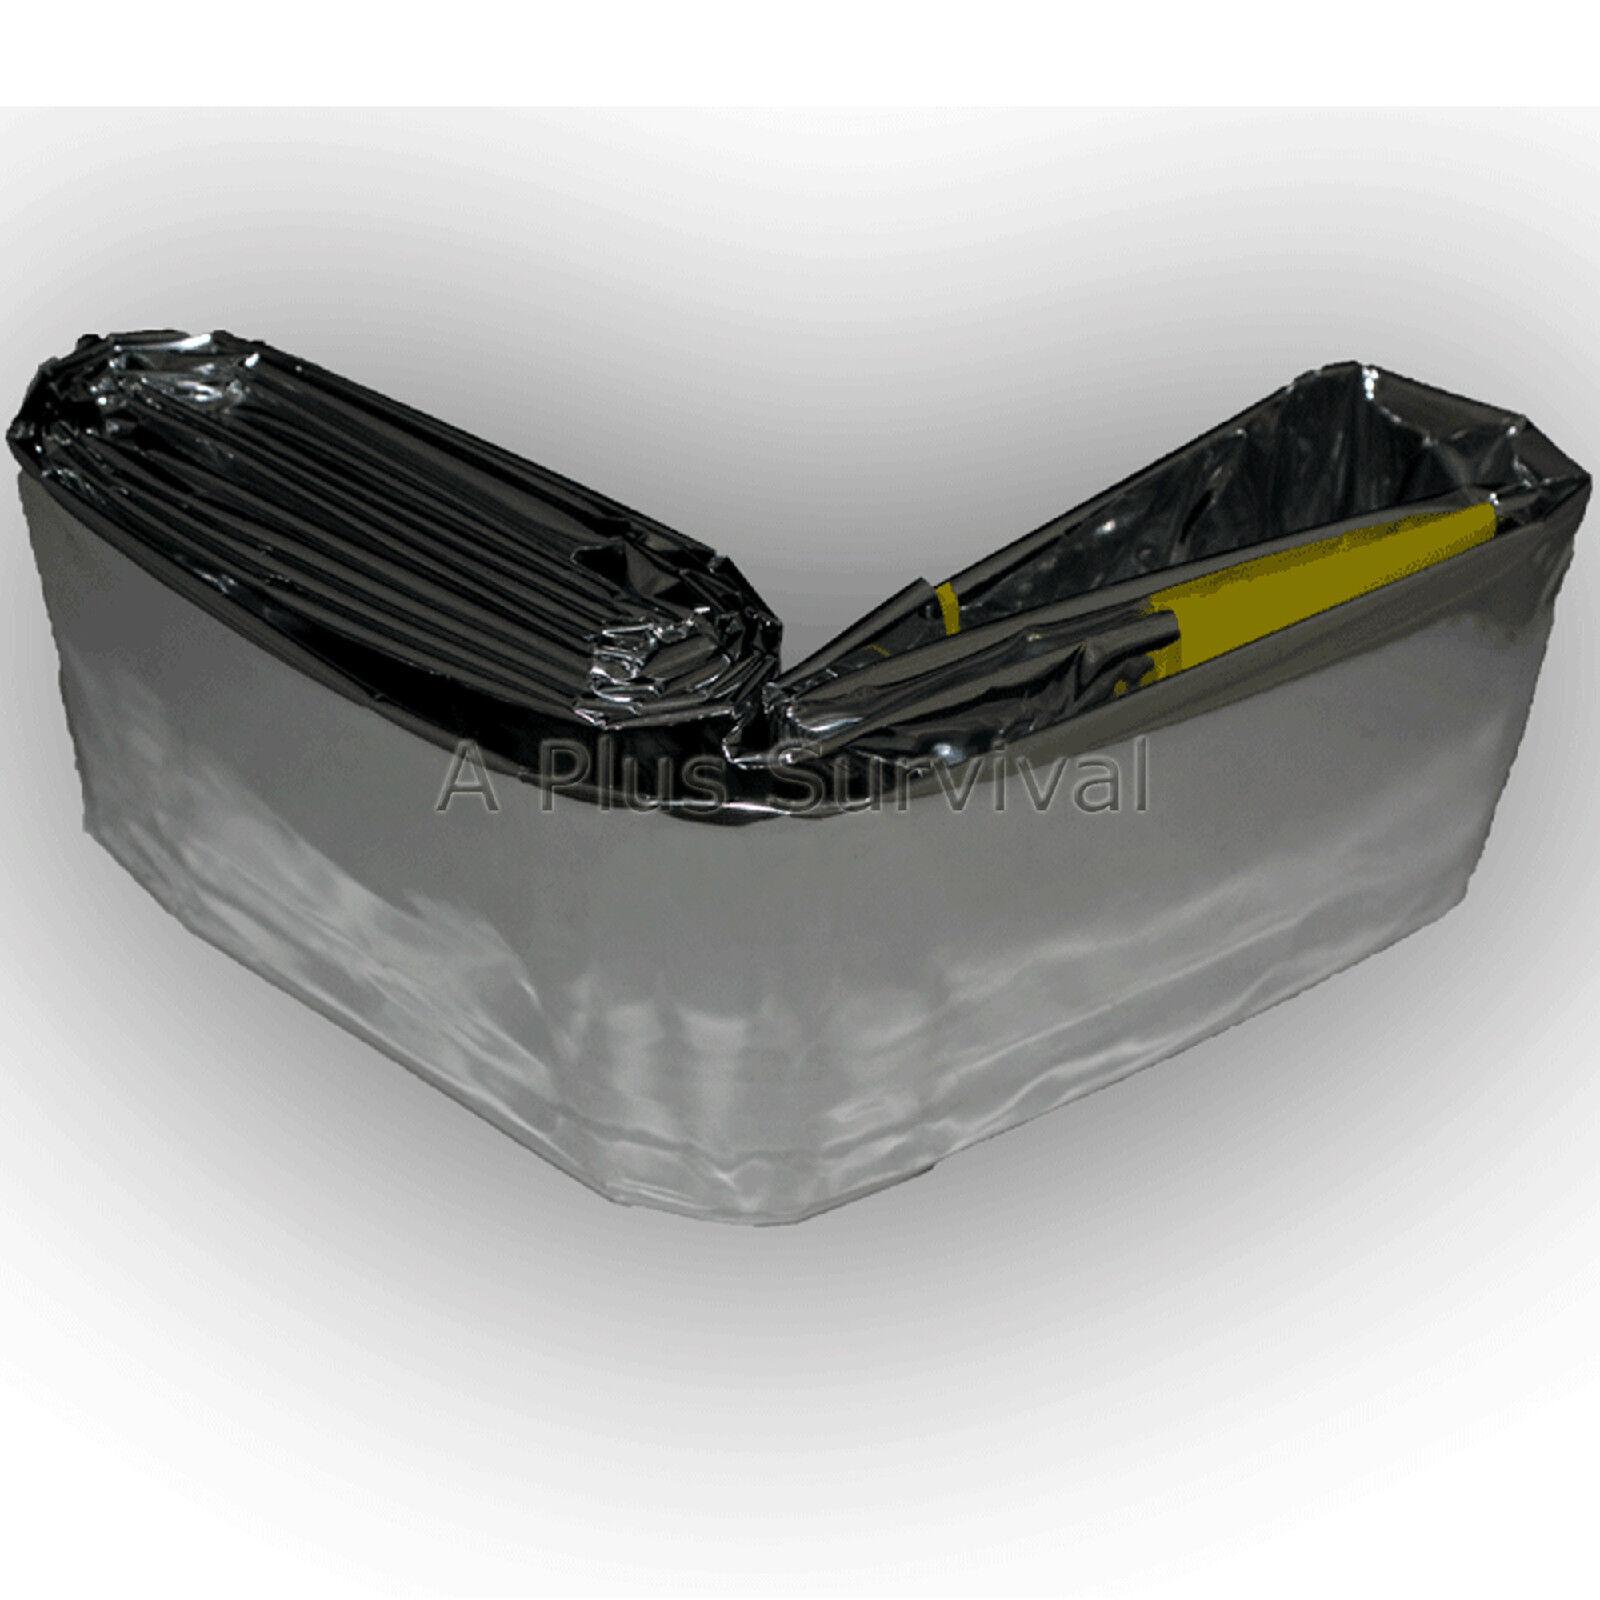 Lot of 10 Emergency Kit Survival Thermal Mylar Solar Sleeping Bag 84  x 36